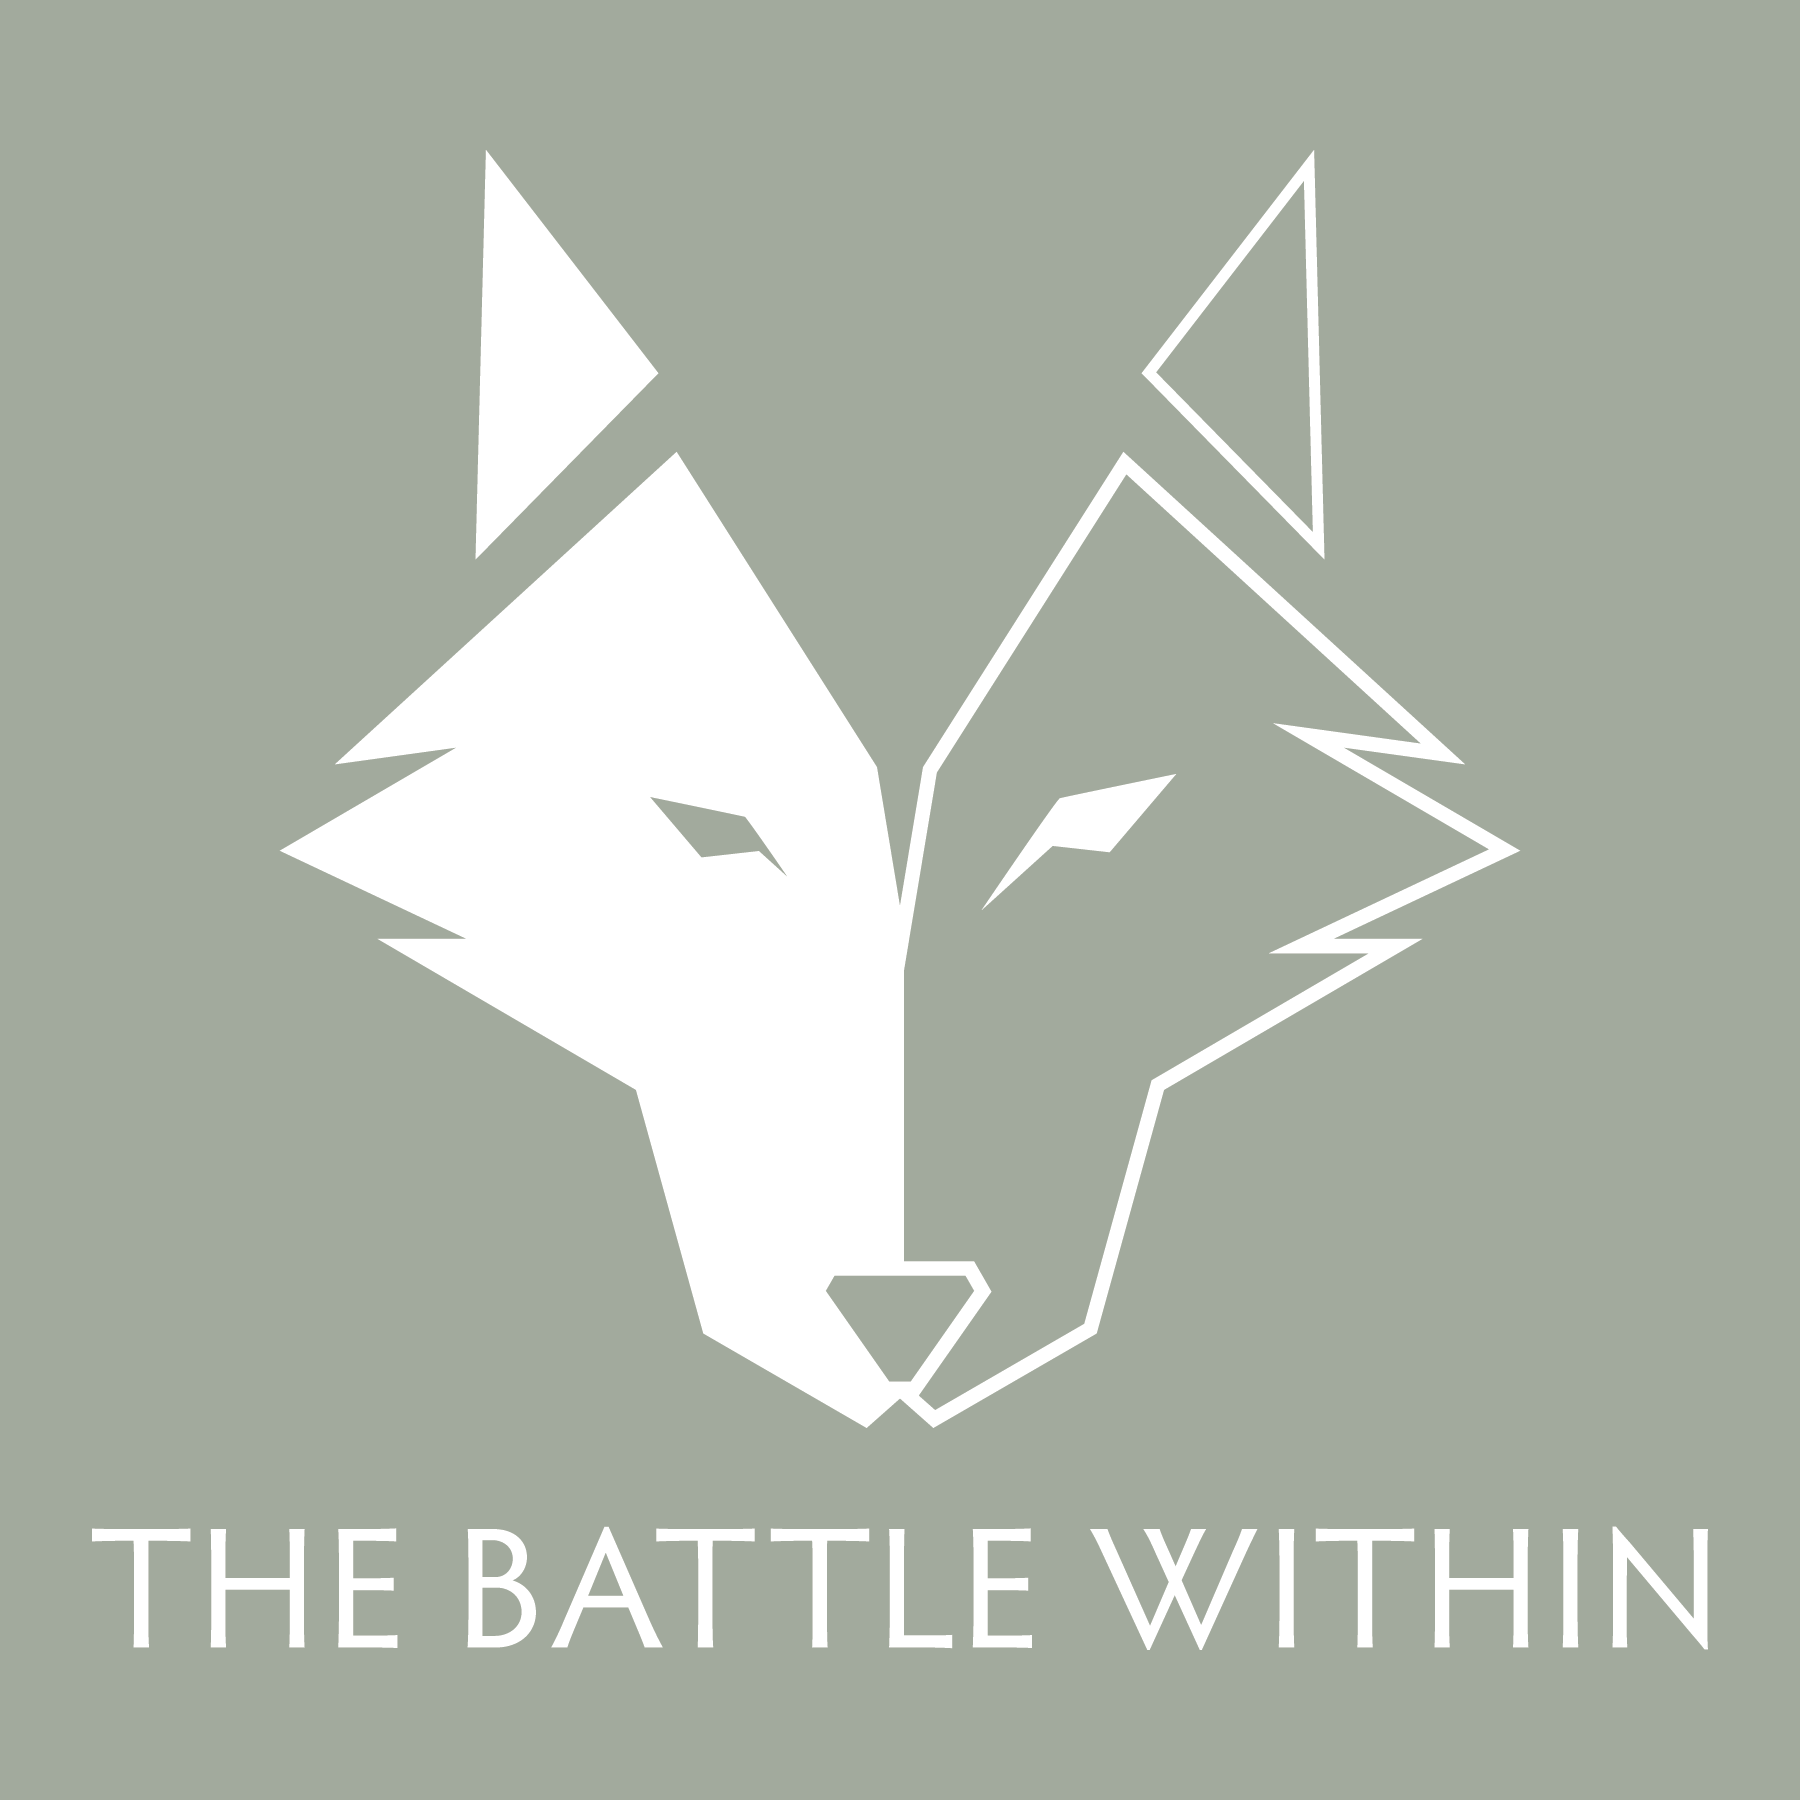 battlewithin_logo-01.png